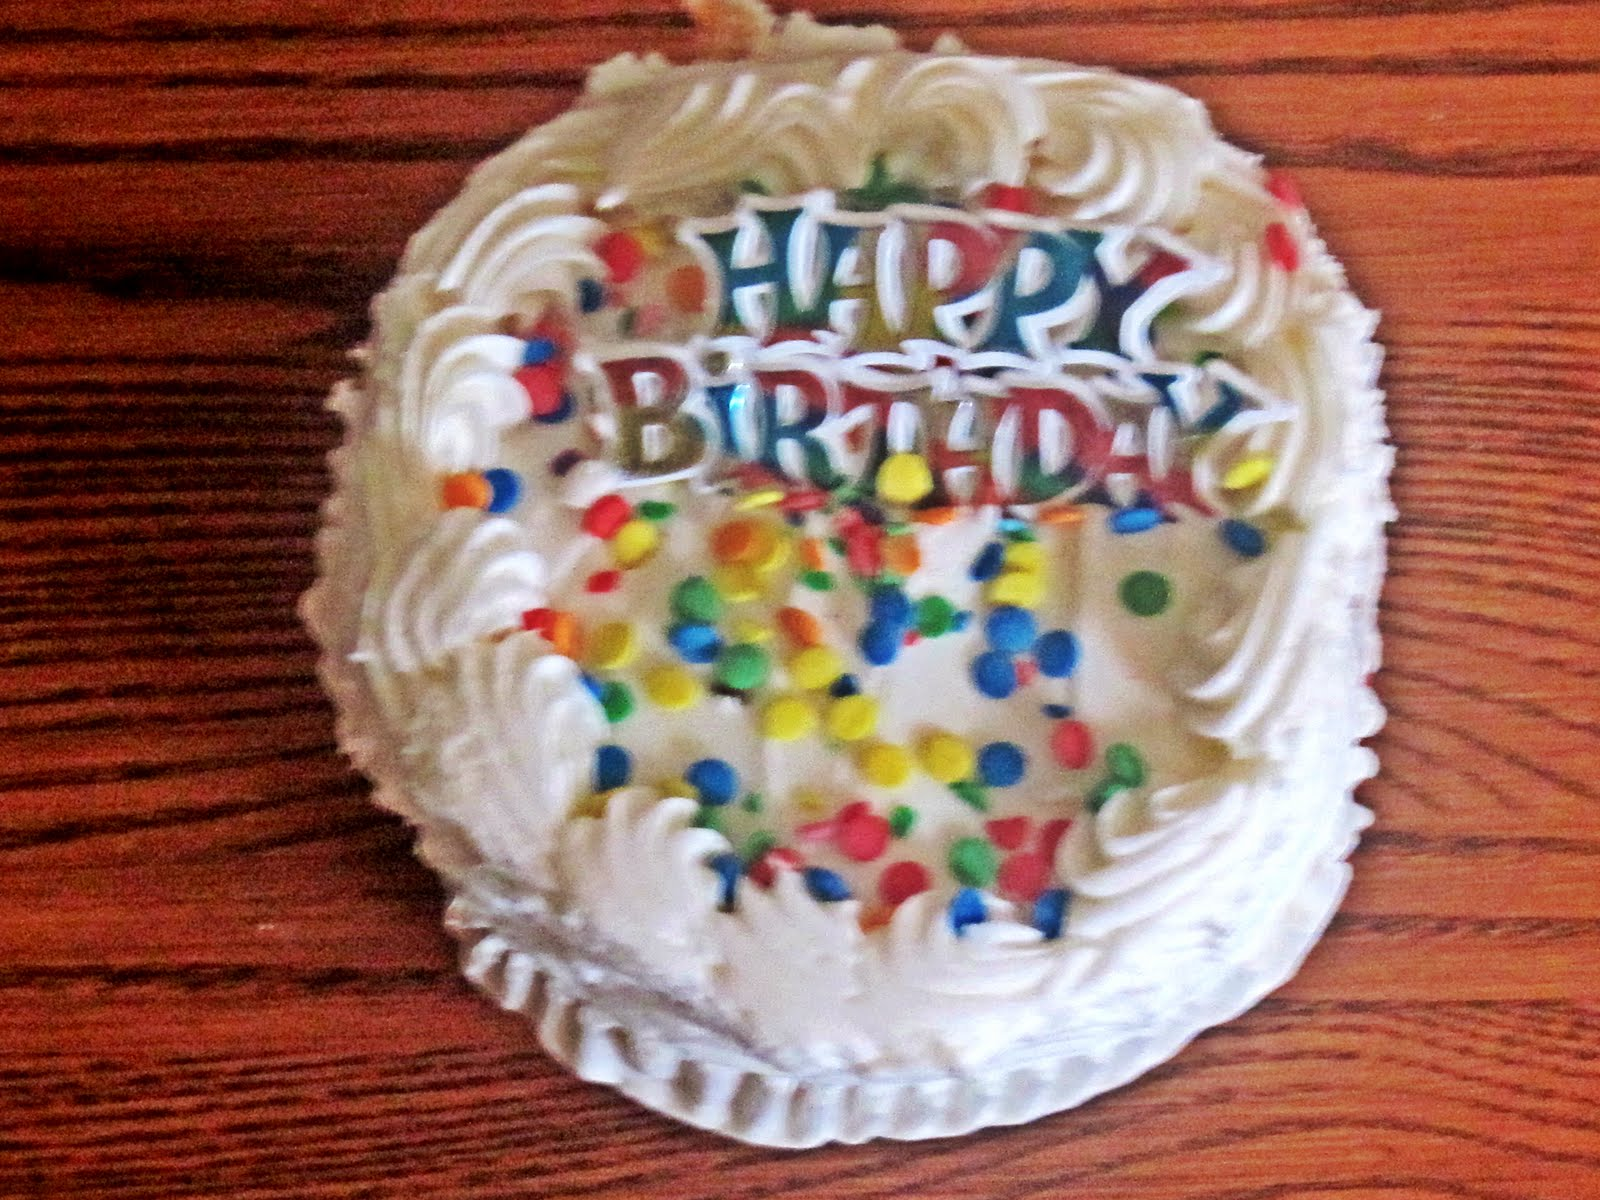 Superstore Birthday Cakes